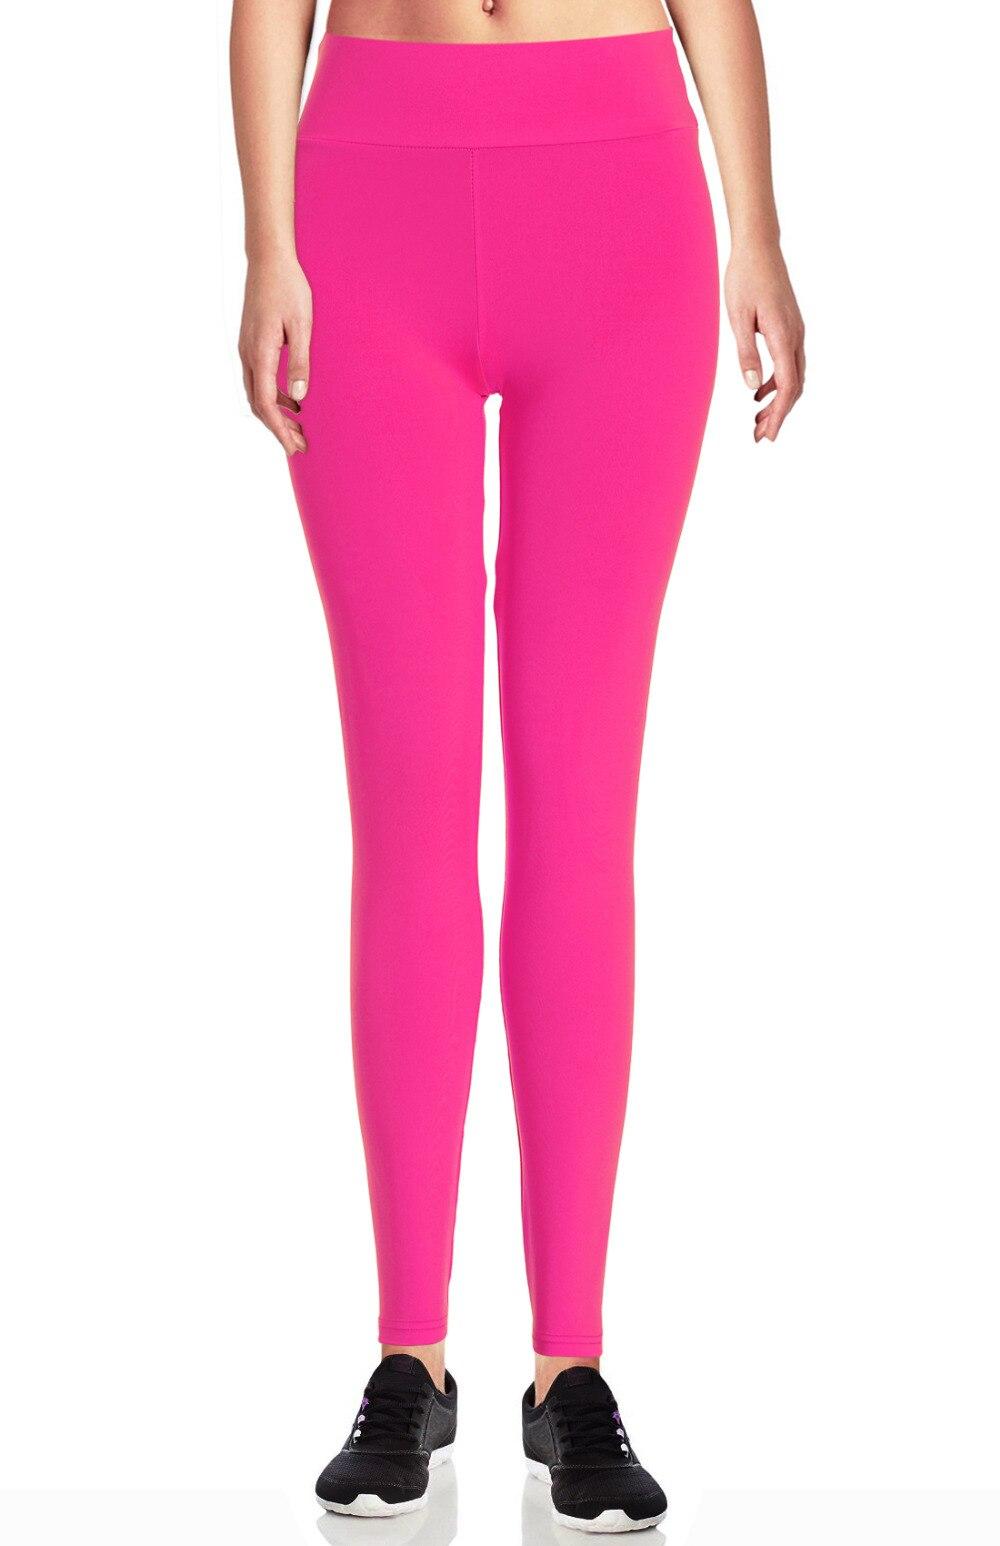 493444e0cb83c Everbellus Femme Fitness High Elastic Black Solid Sporting Leggings ...